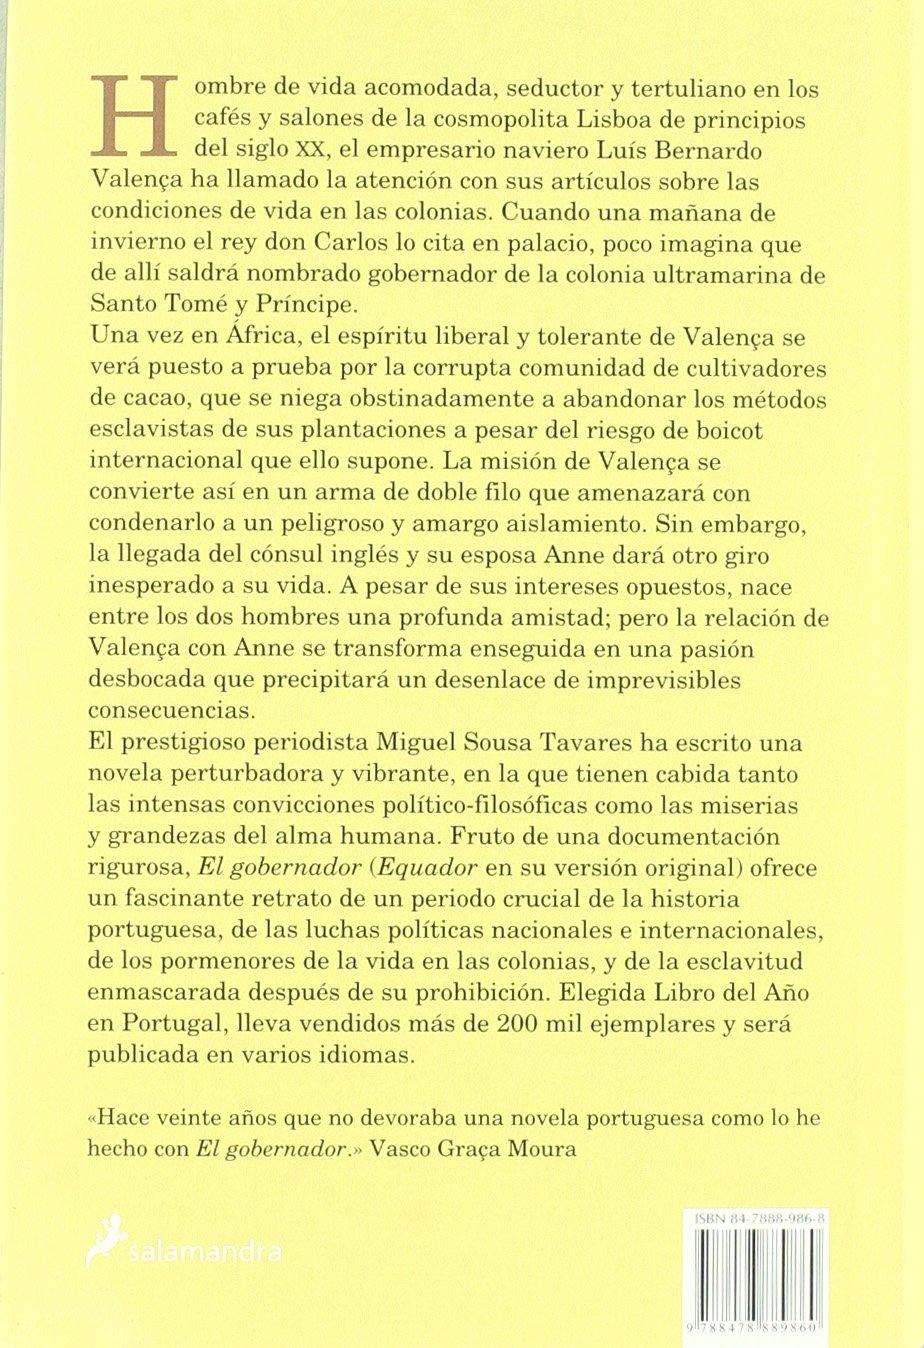 El gobernador (Novela Histórica): Amazon.es: Miguel Sousa Tavares: Libros